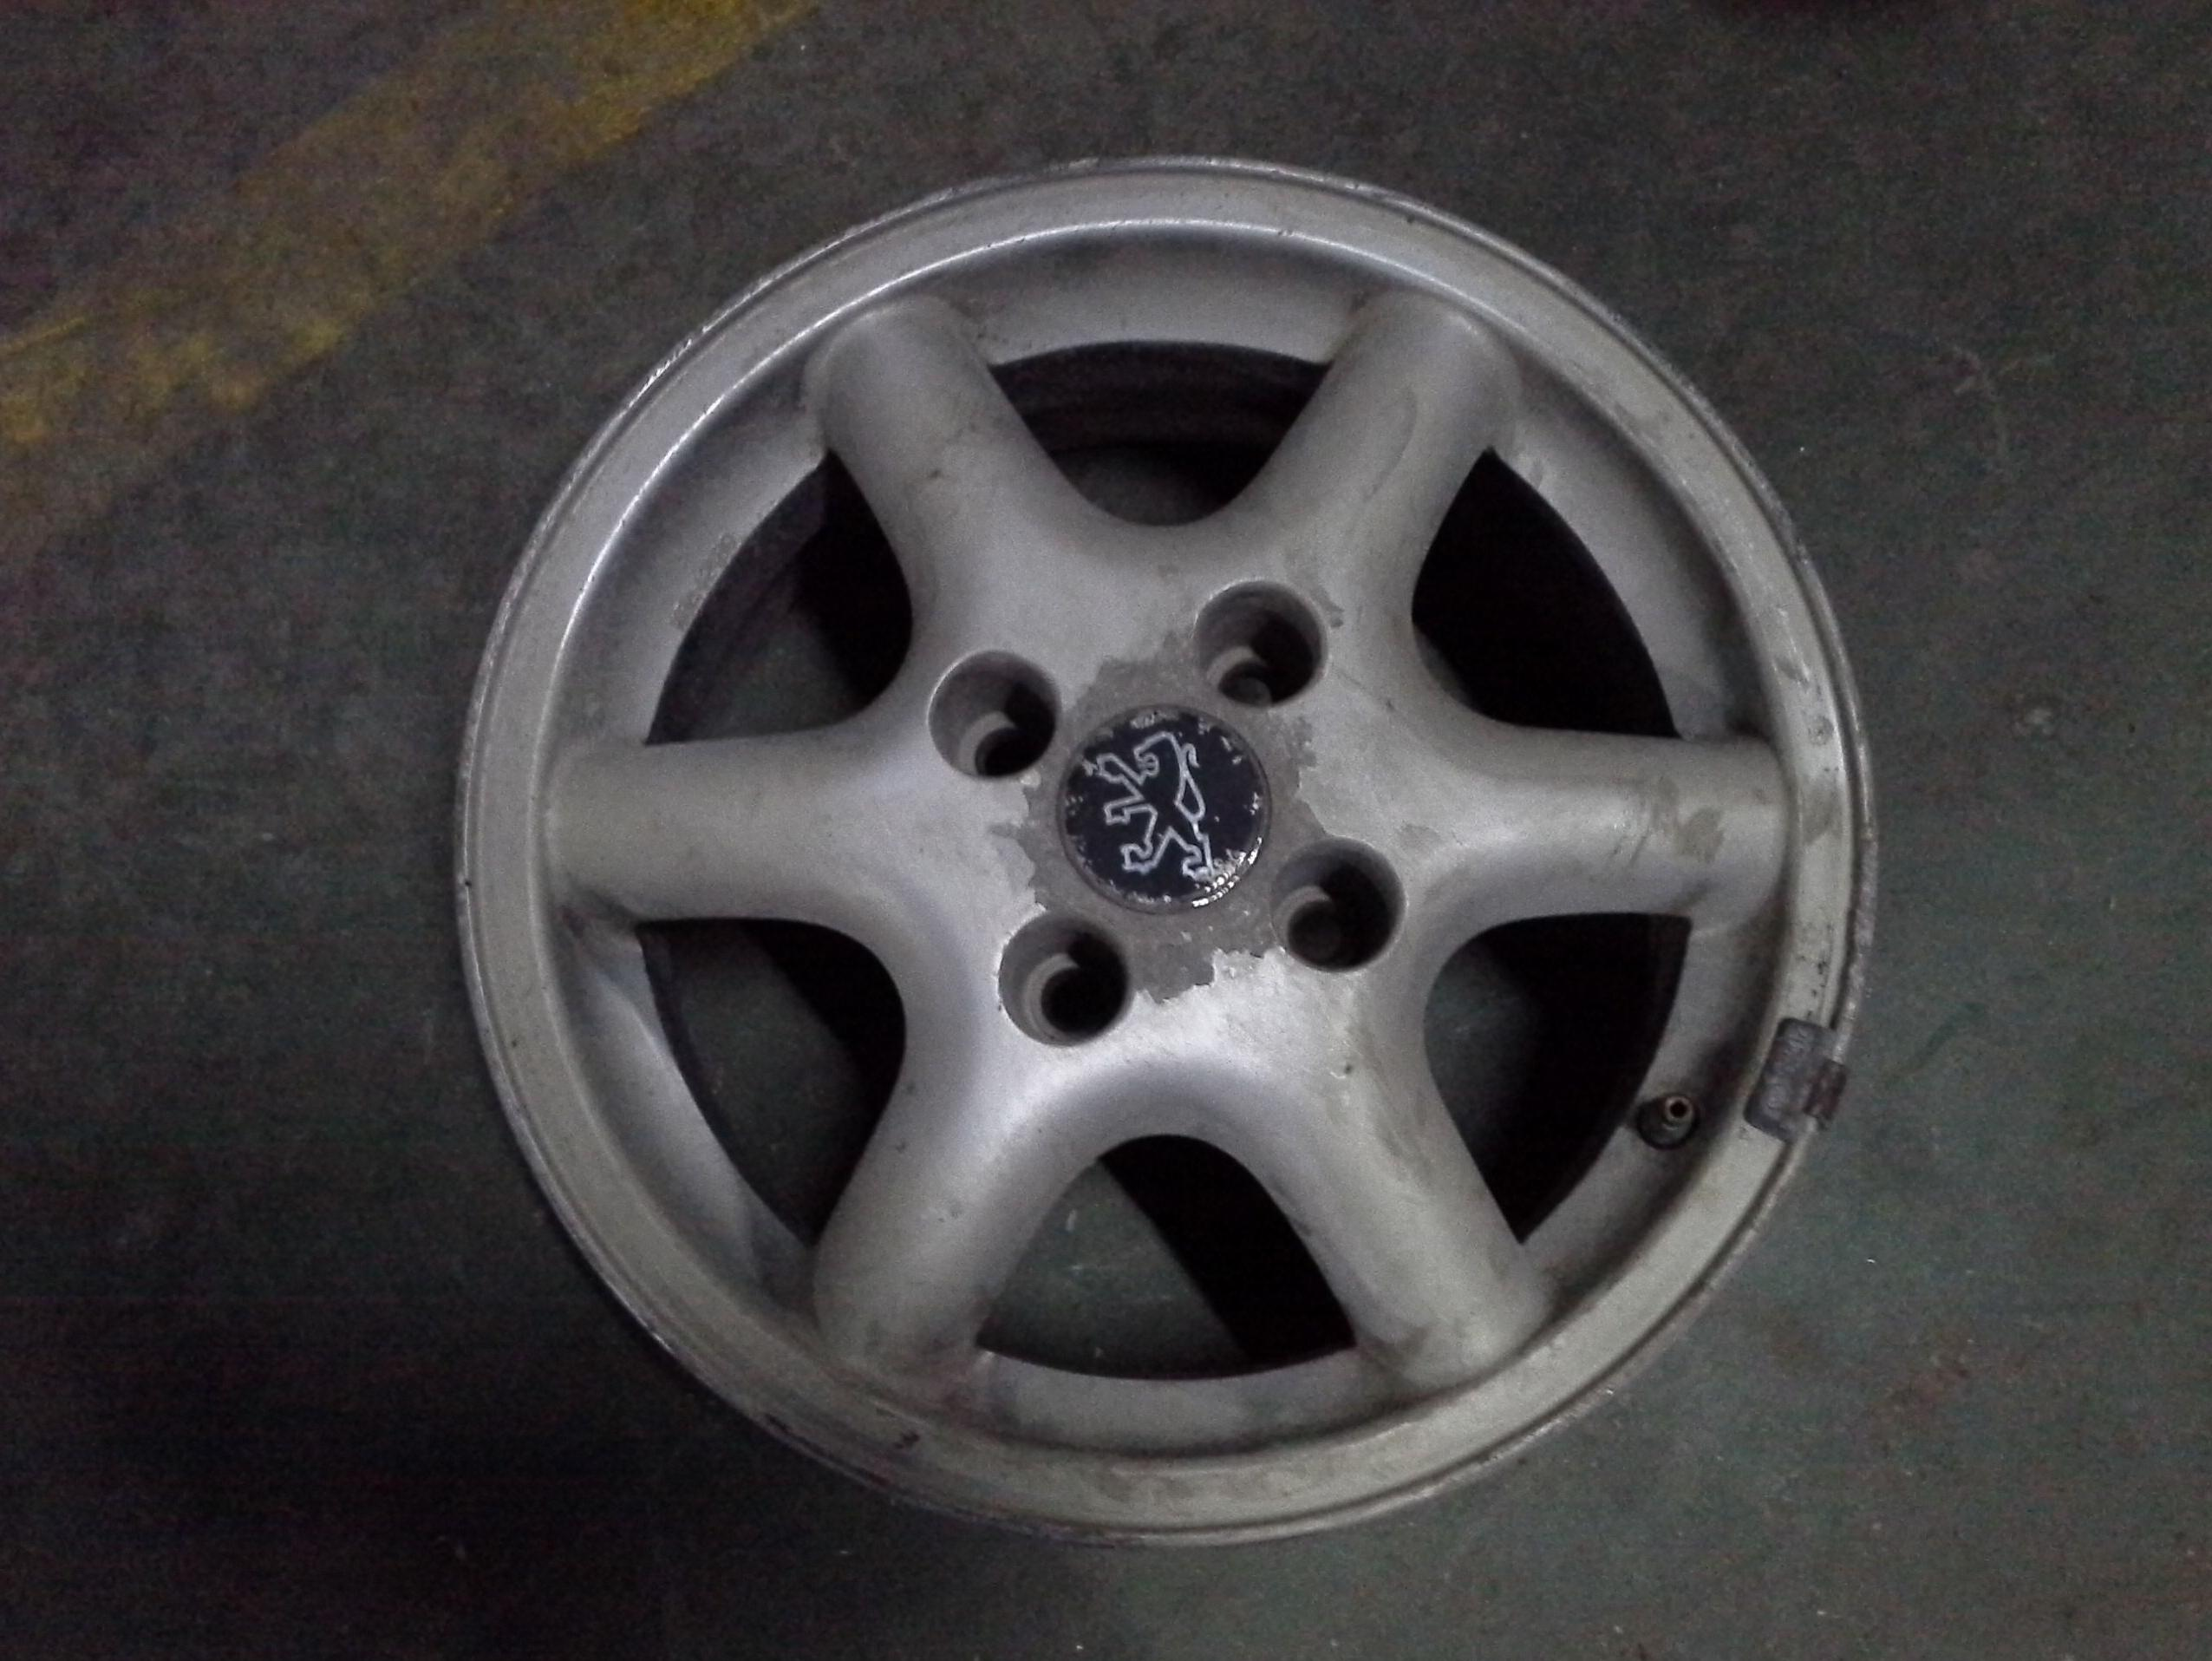 Llantas de aluminio de Peugeot en R14 de 4 tornillos